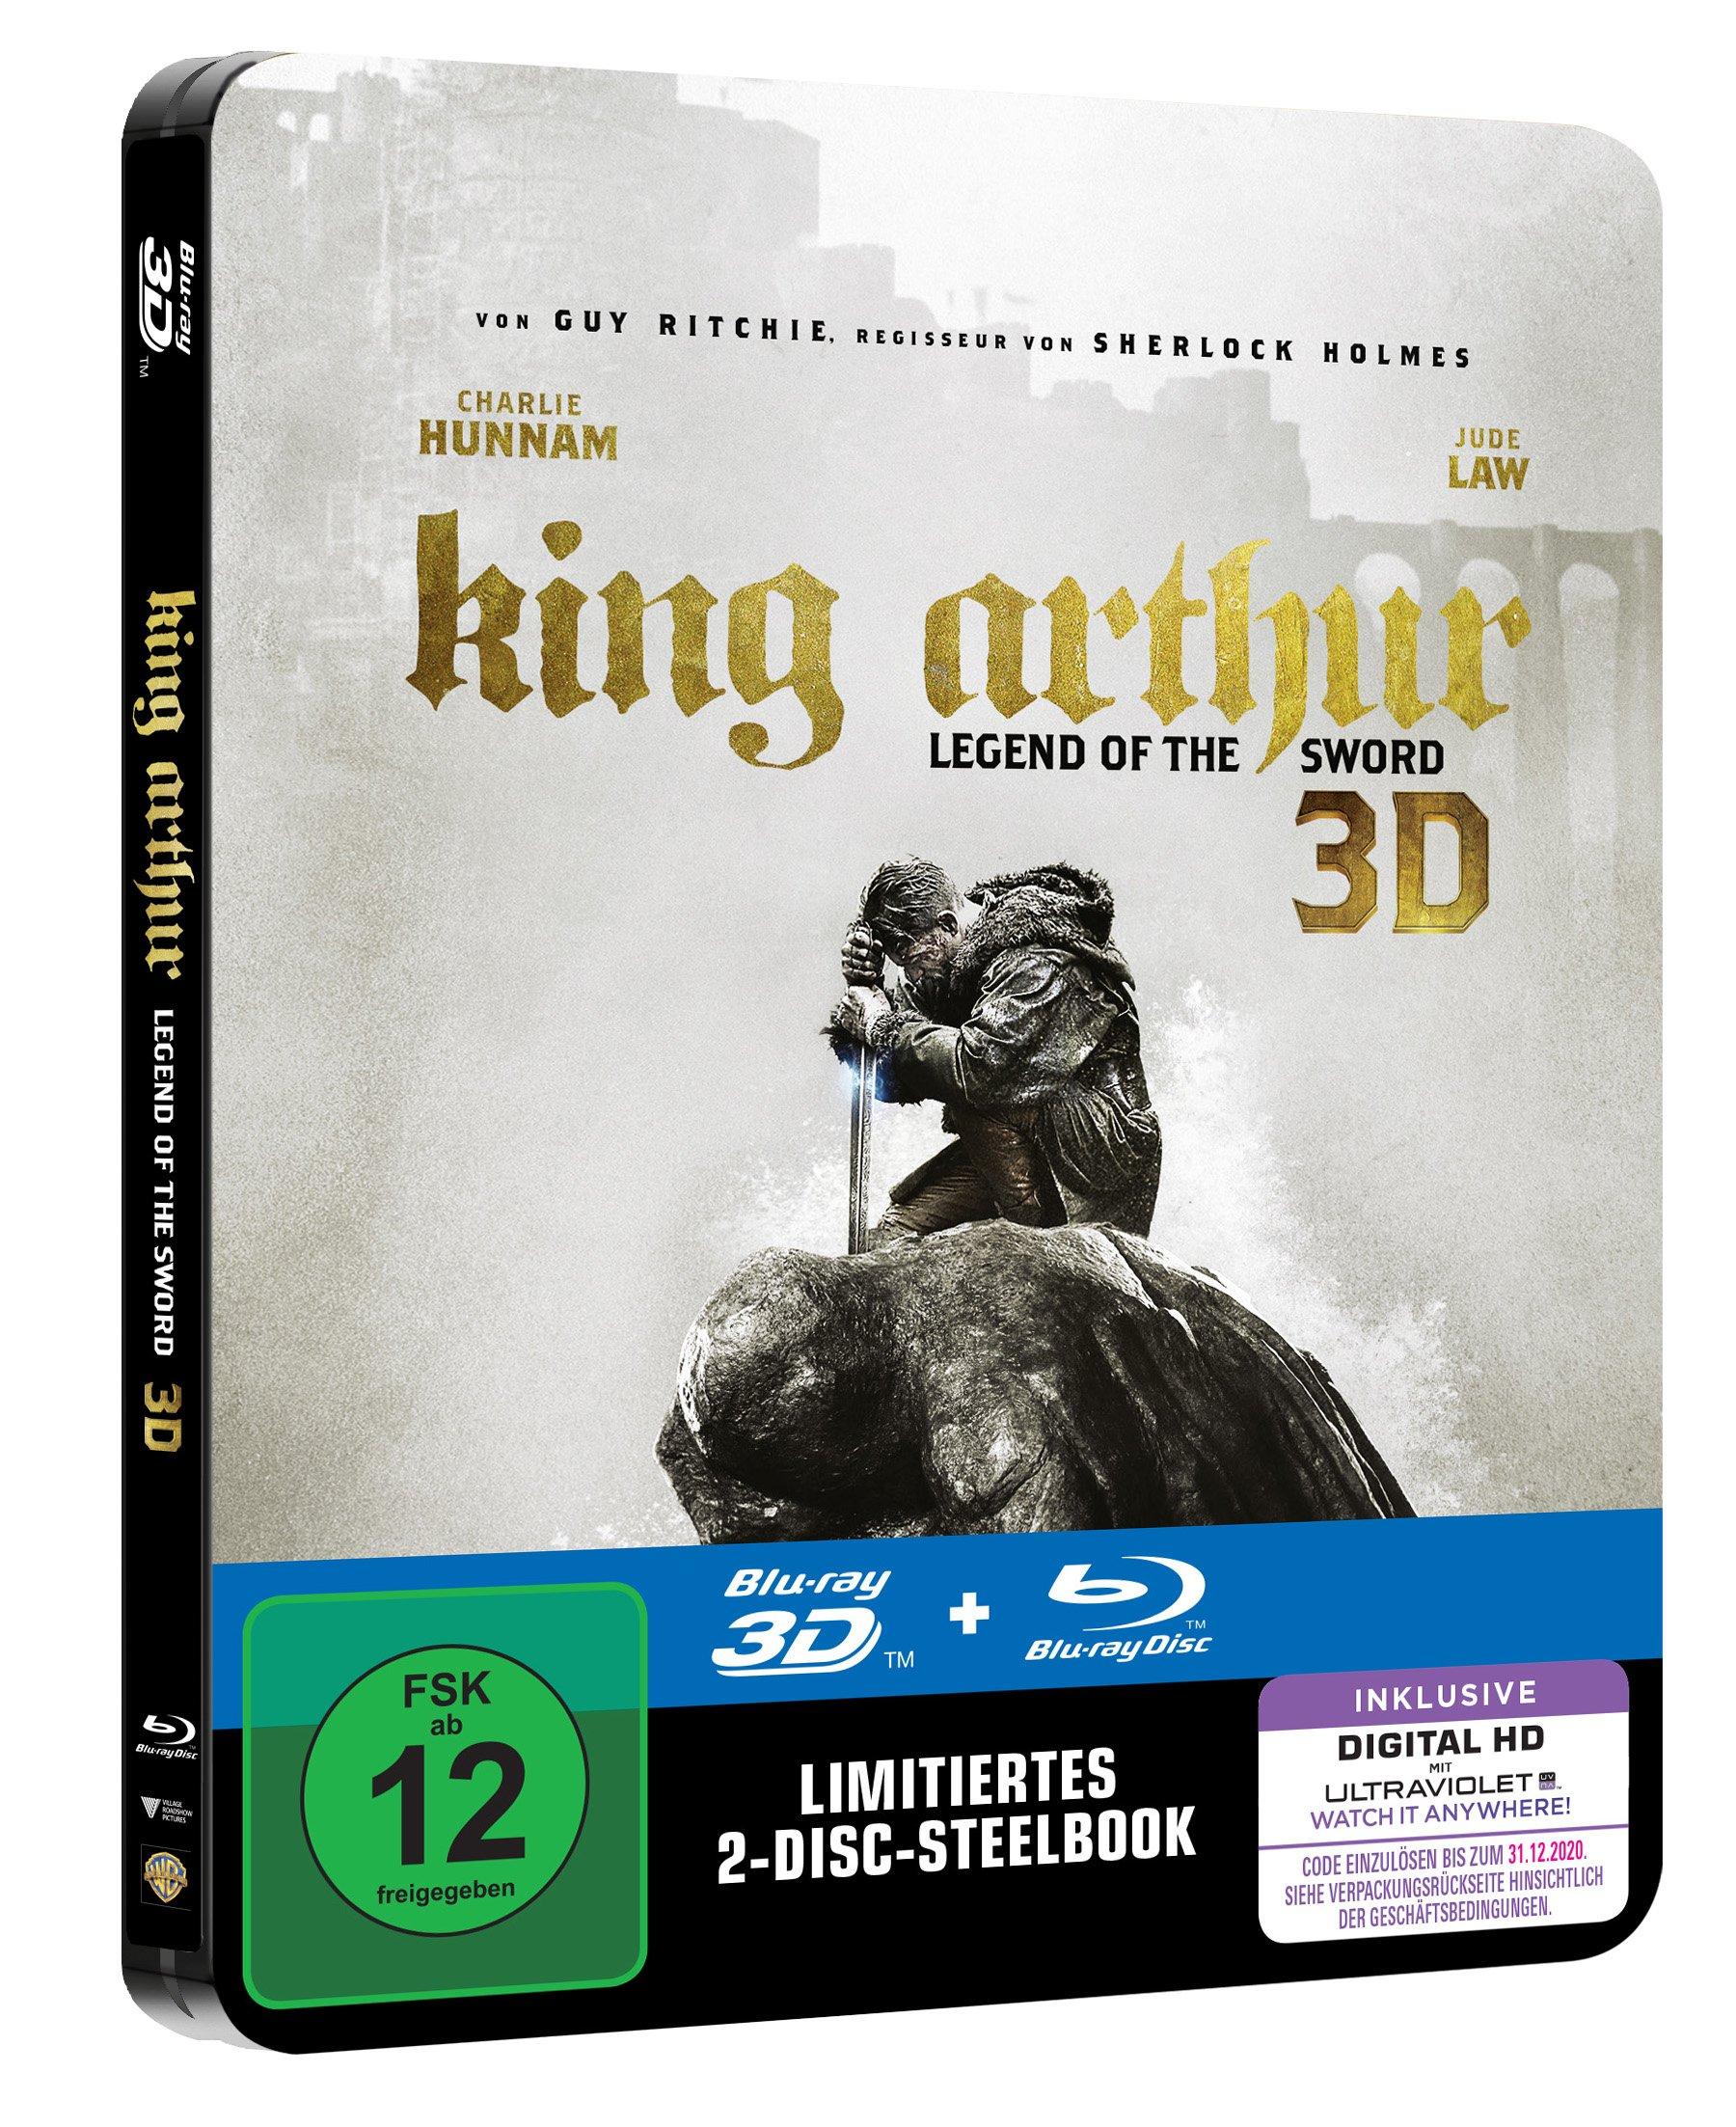 King.Arthur.Legend.of.the.Sword.3D.2017.German.DL.1080p.BluRay.x264-BluRay3D